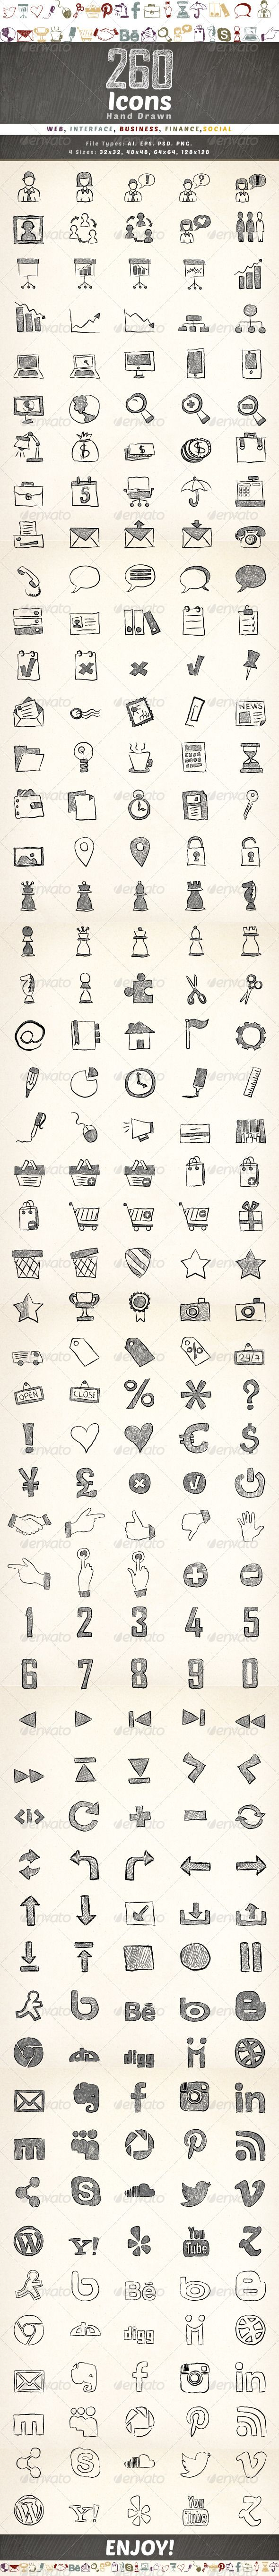 260 Hand Drawn Icons